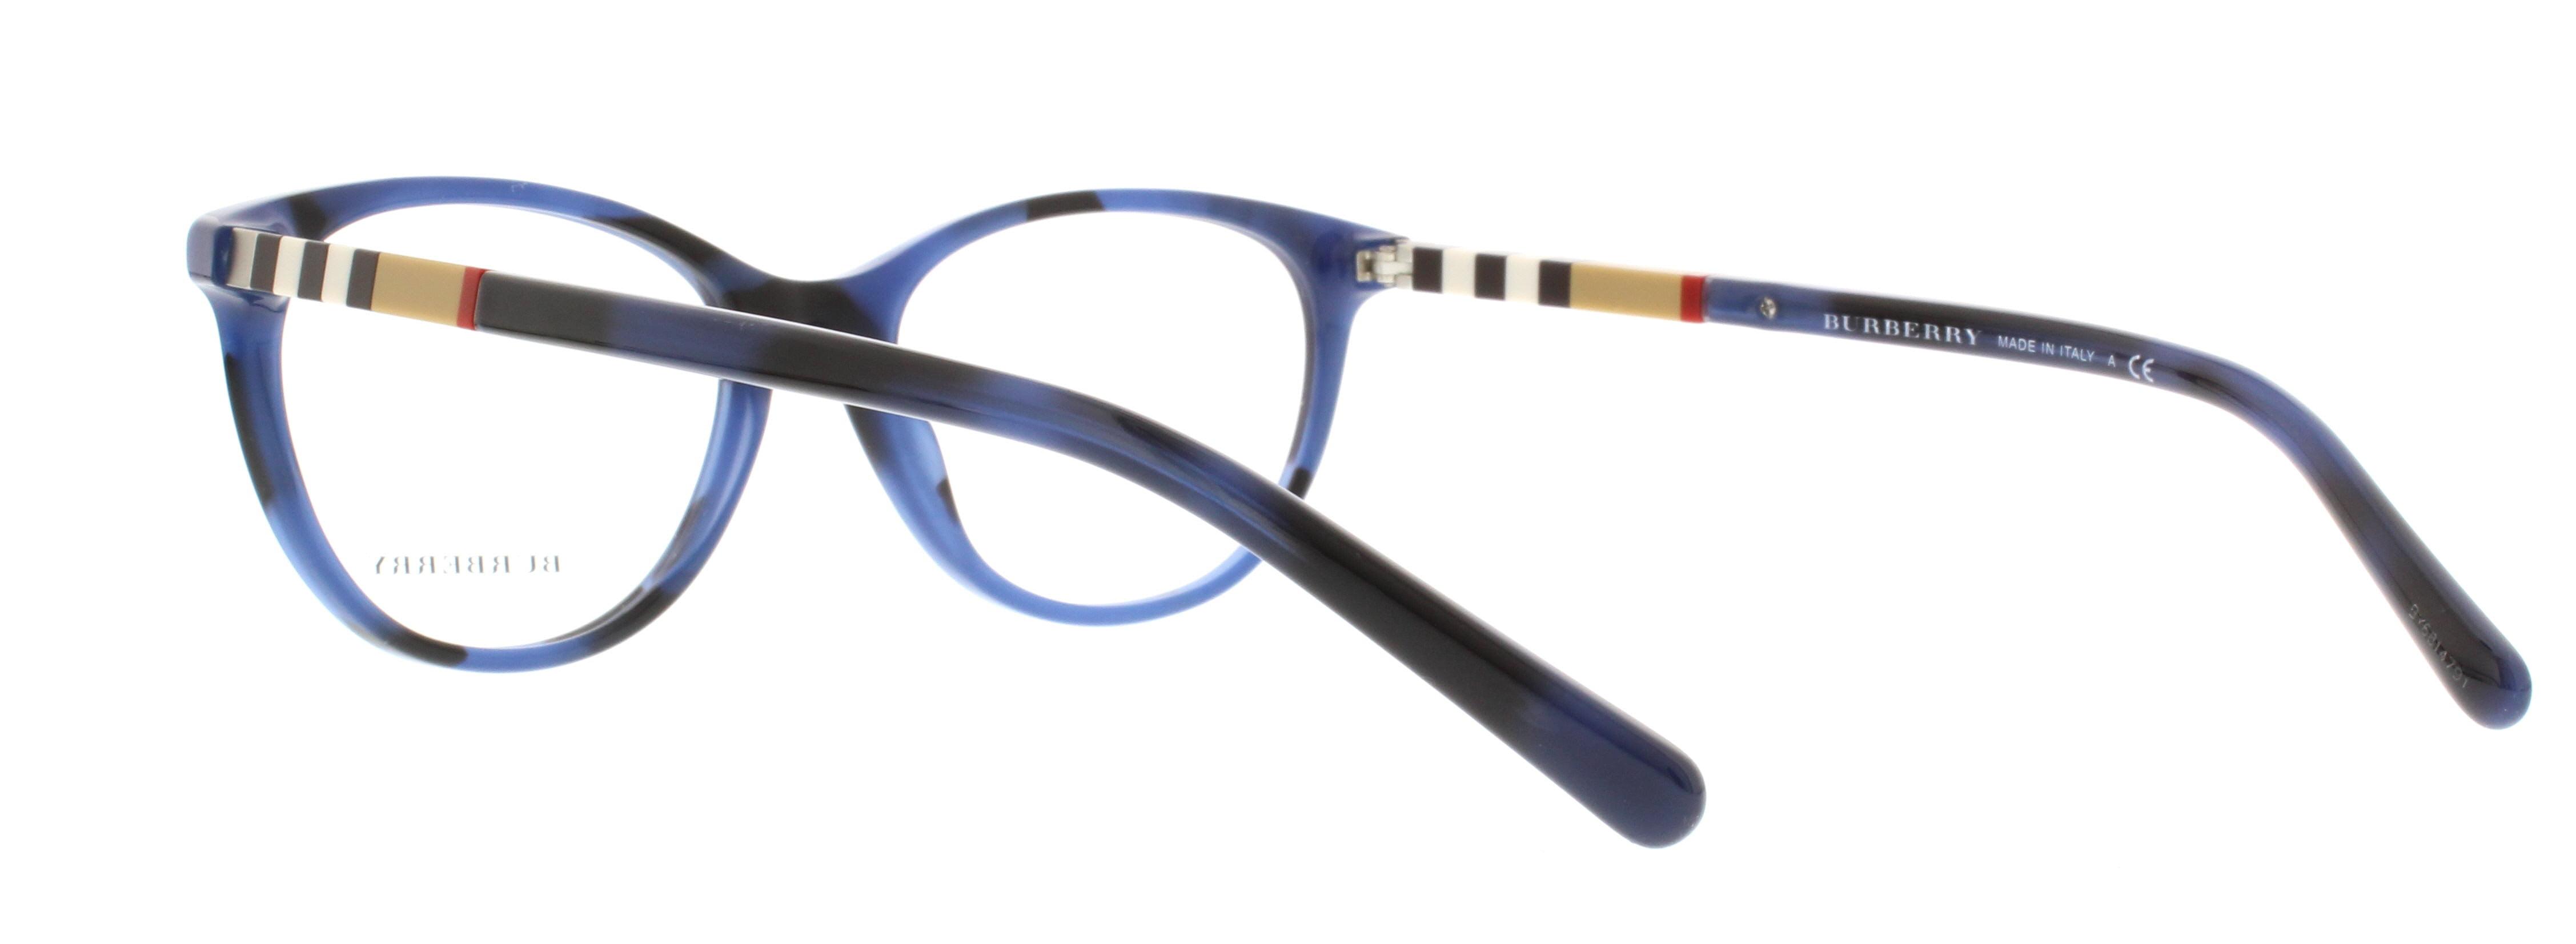 a42bd8b490d BURBERRY Eyeglasses BE 2205 3546 Spotted Blue 52MM - Walmart.com